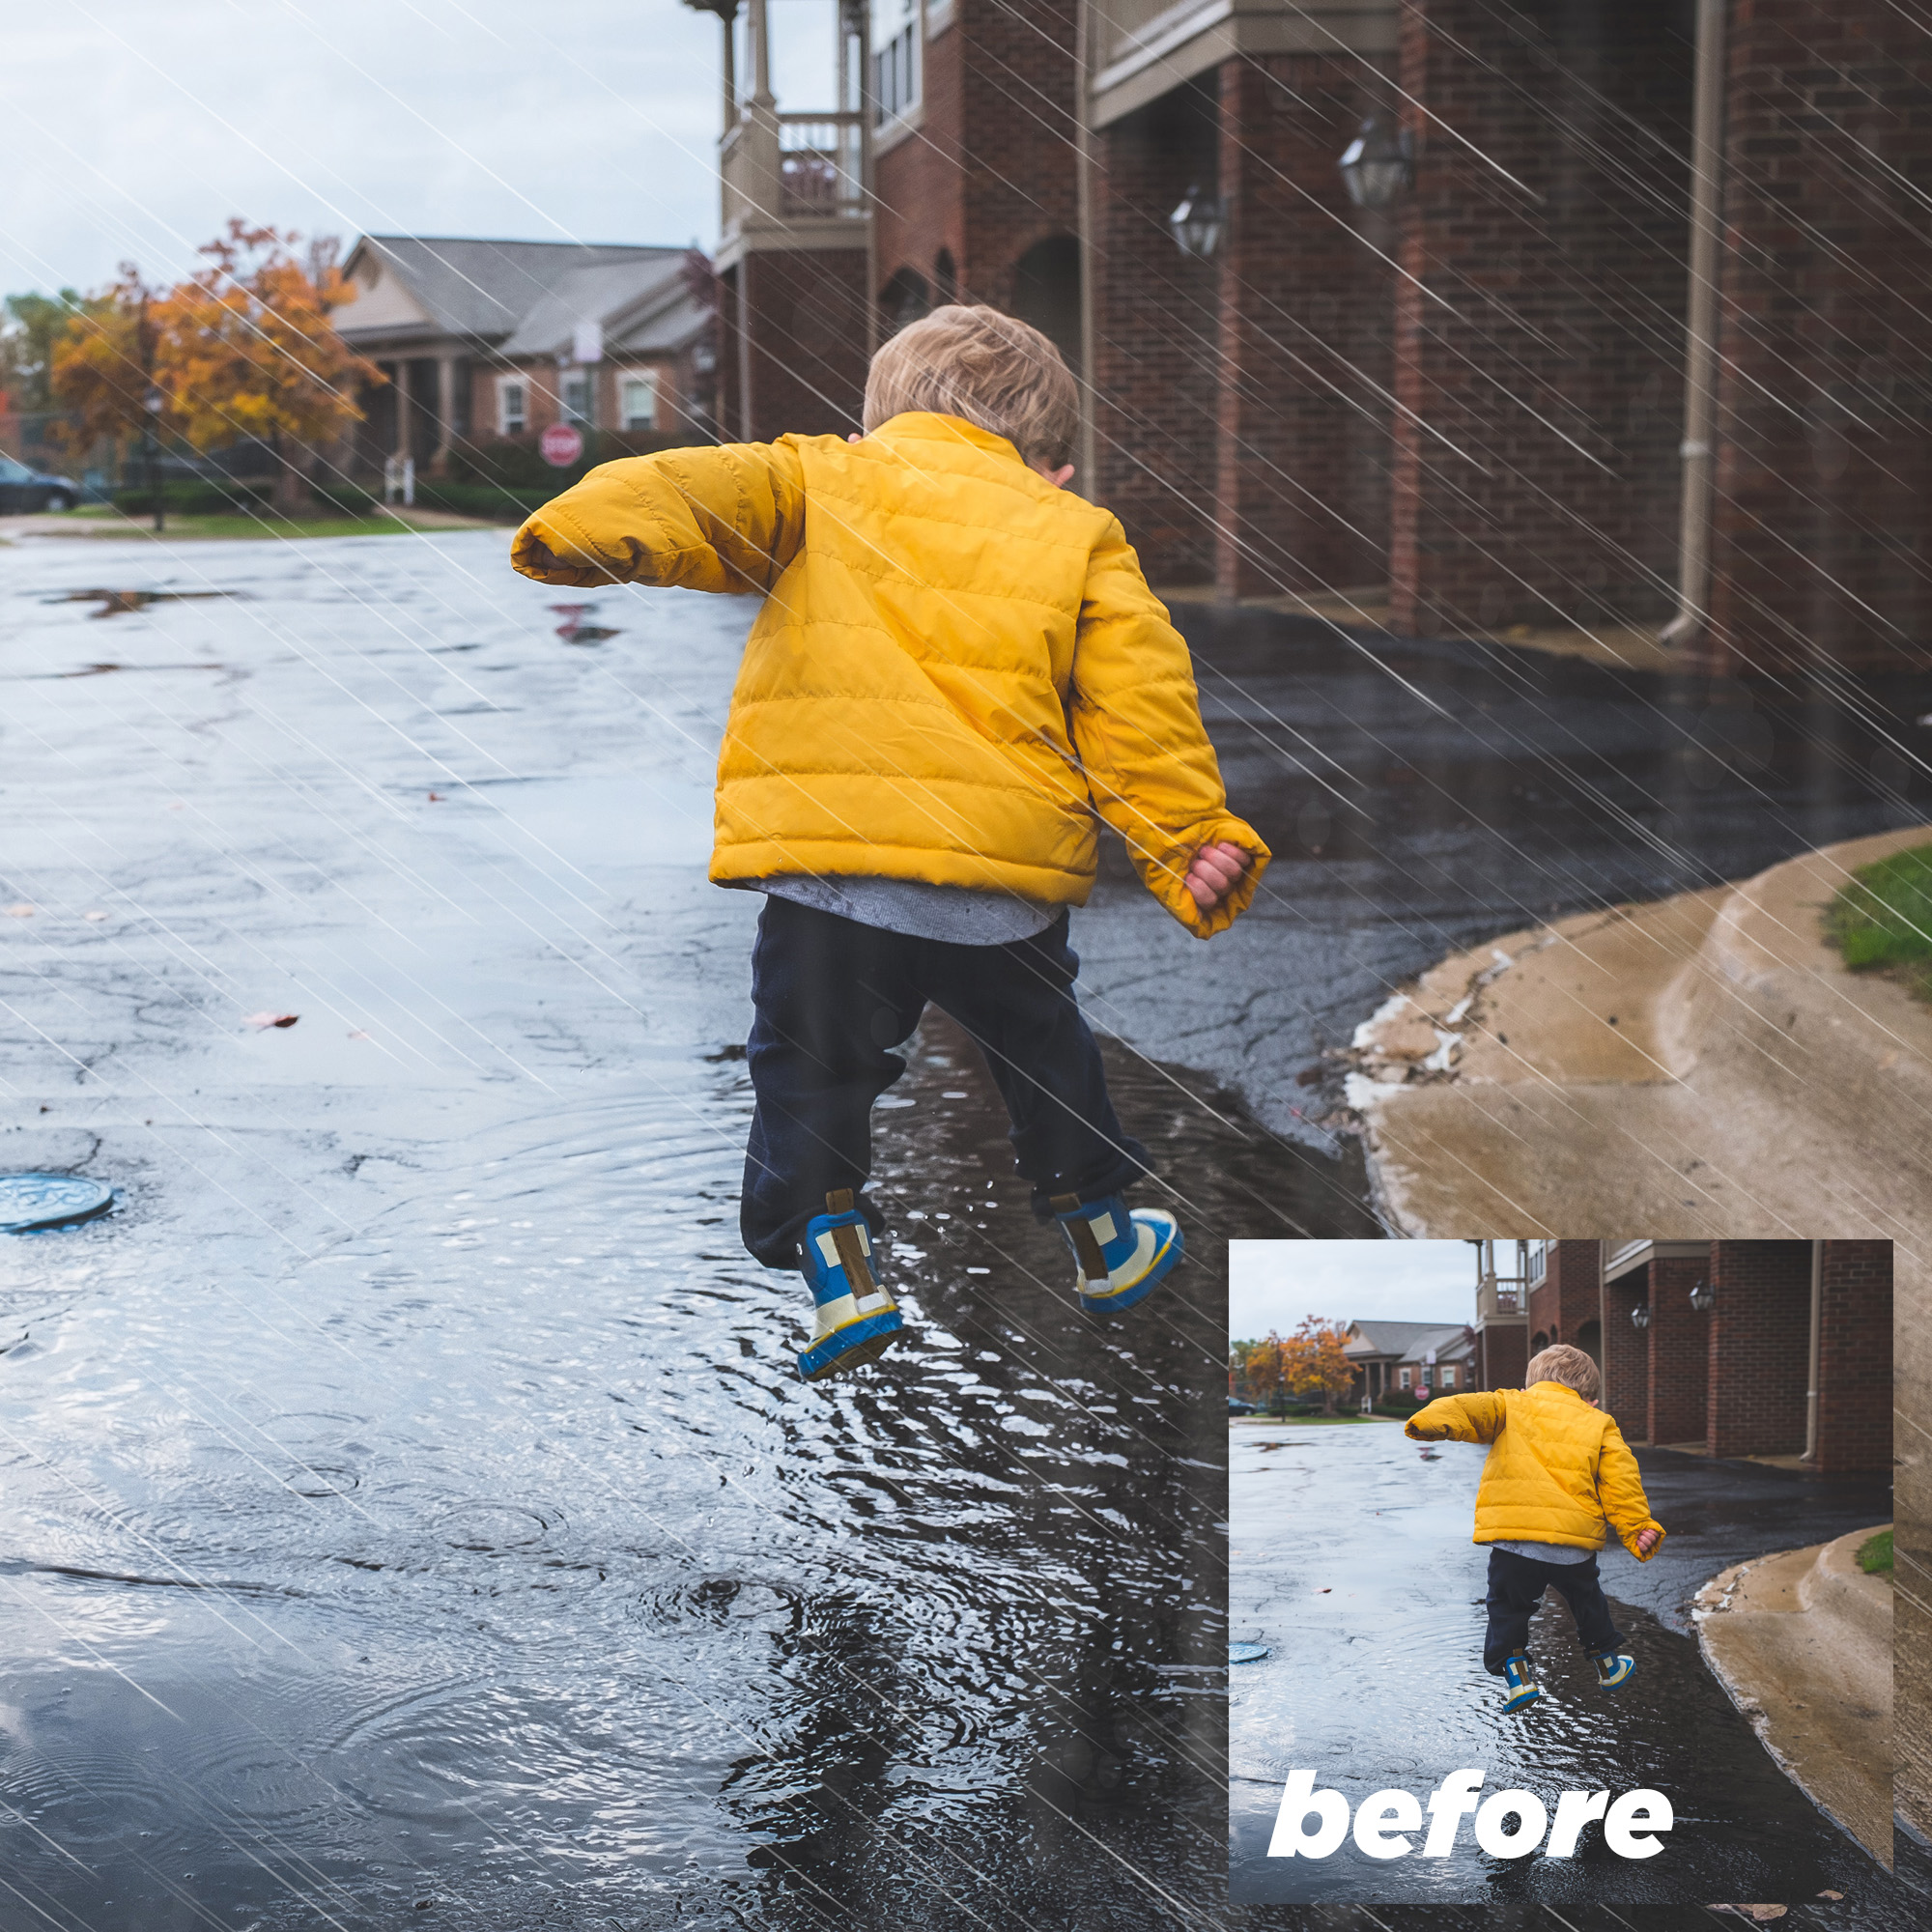 Rain Overlays Clipart, Falling Rain, Photoshop Overlays example image 3